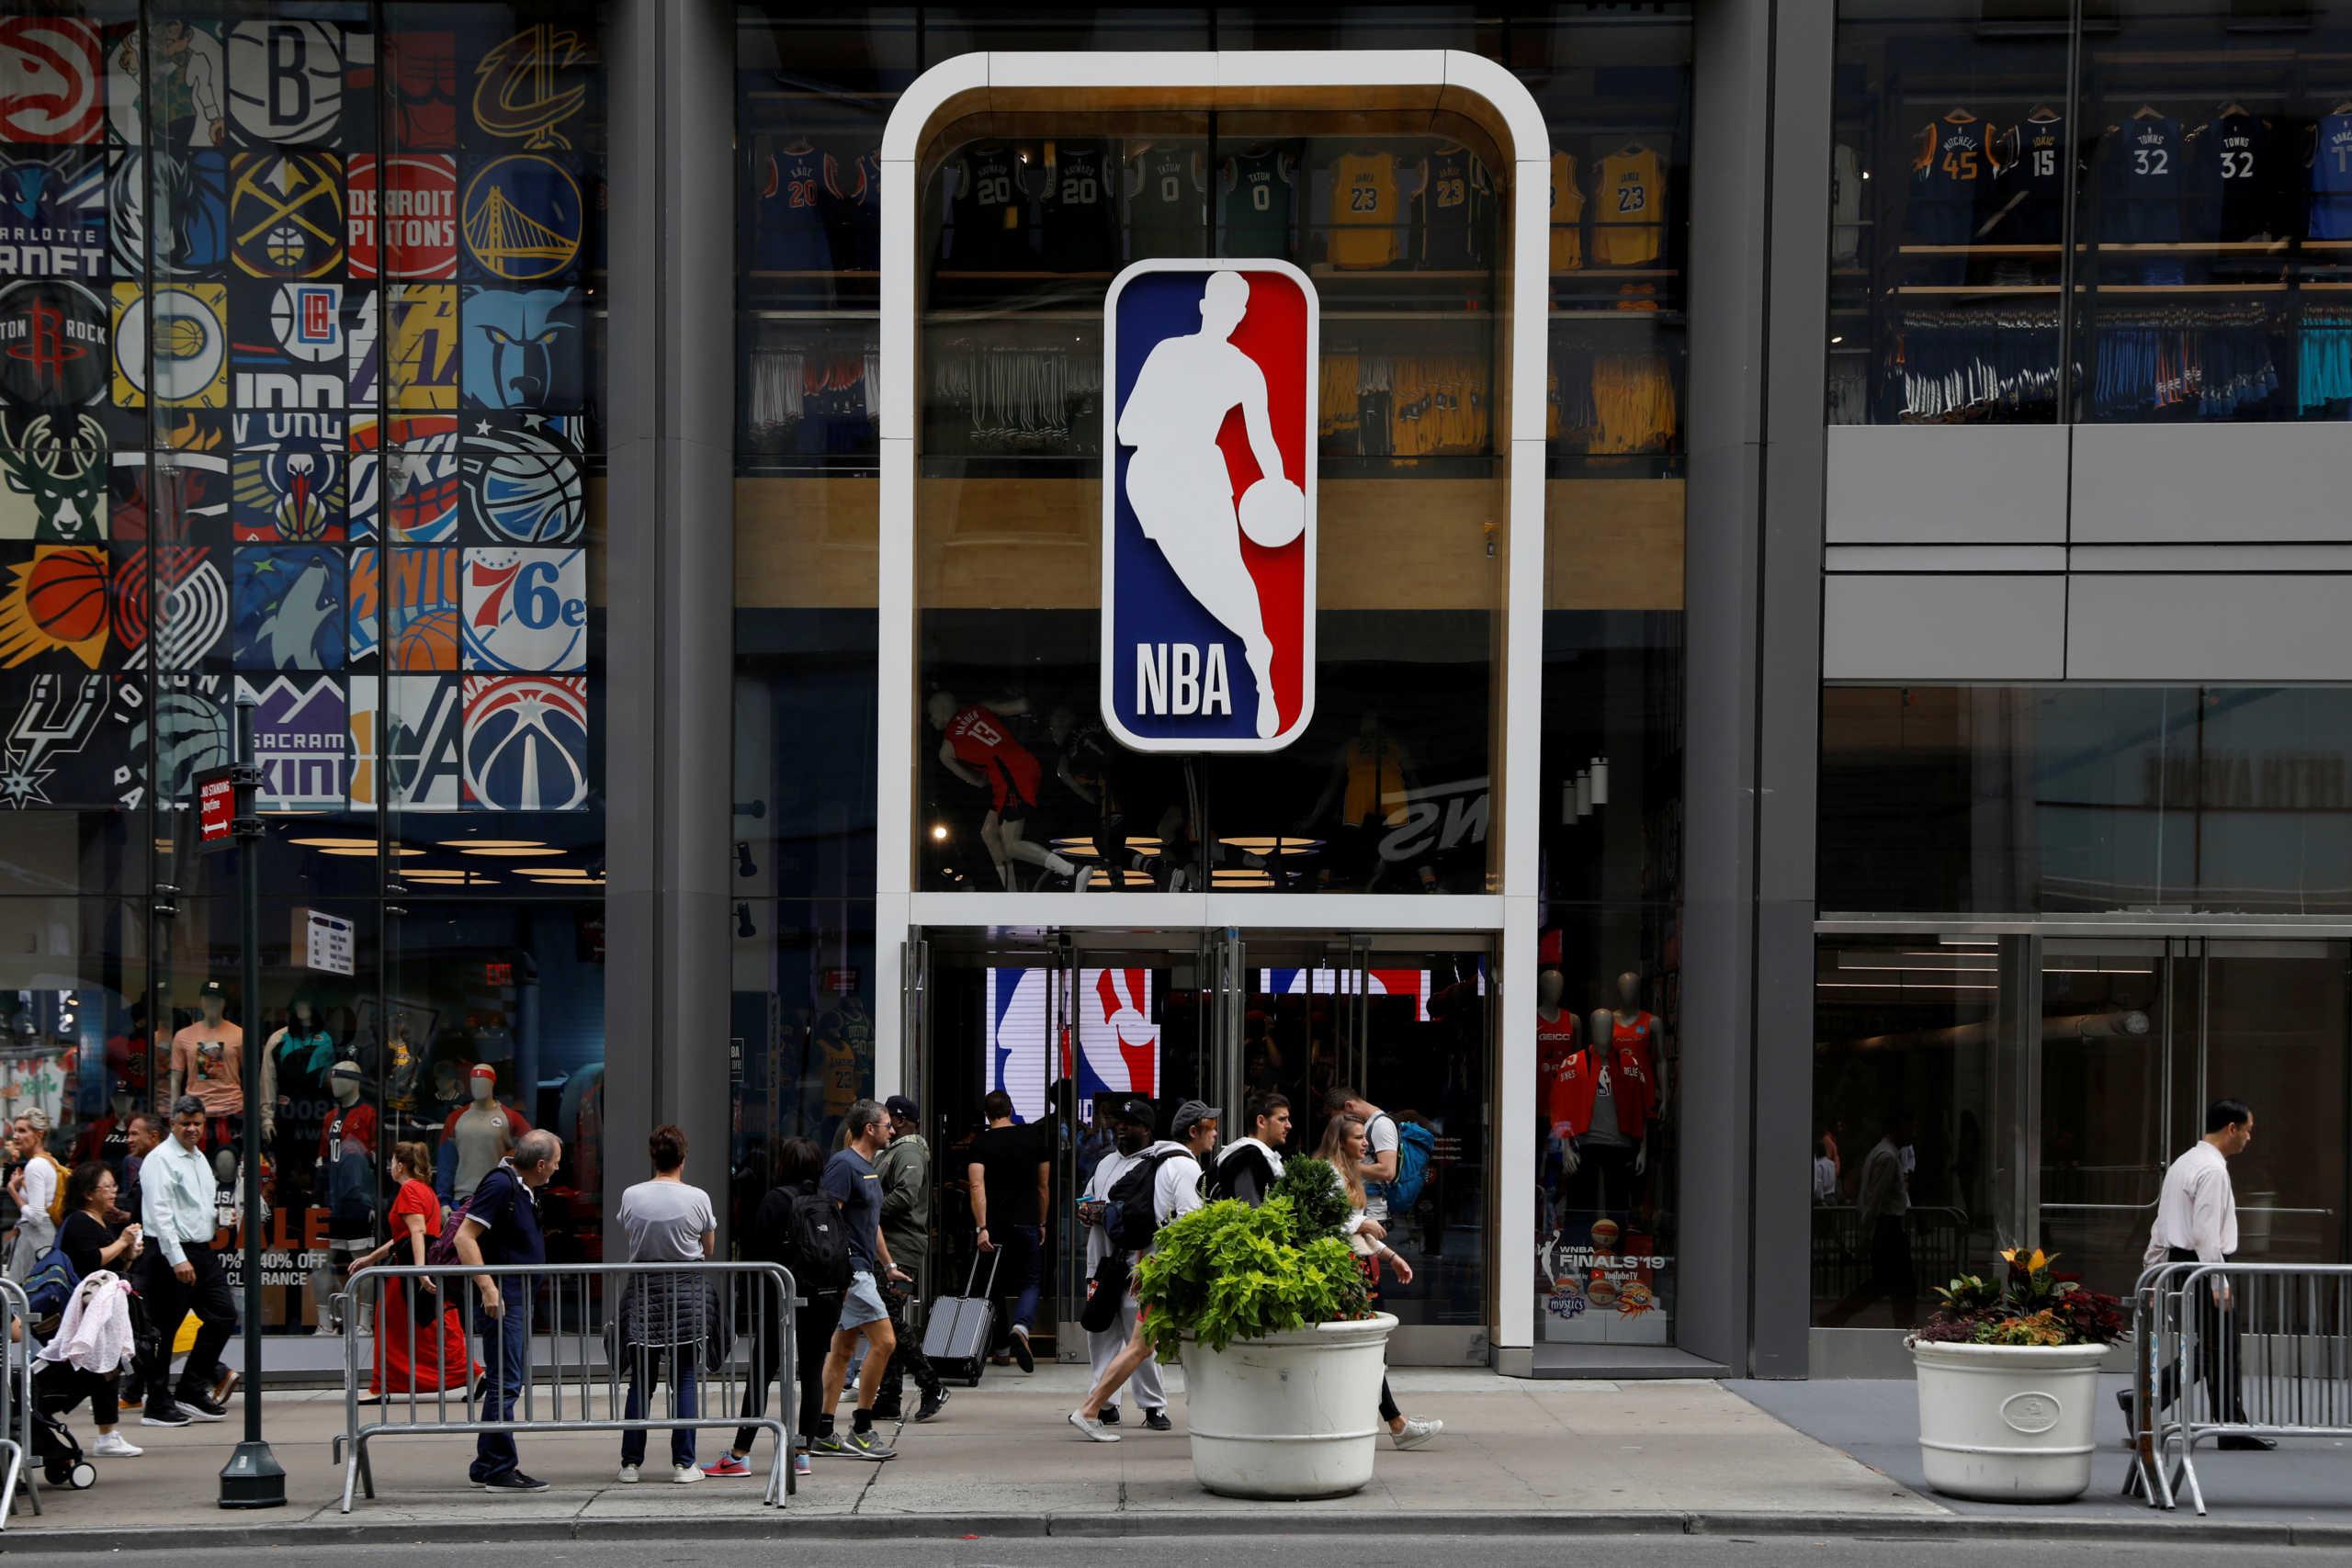 NBA: Ο Χάουαρντ ζητά να υπάρξει αποχή από τους αγώνες κατά του ρατσισμού